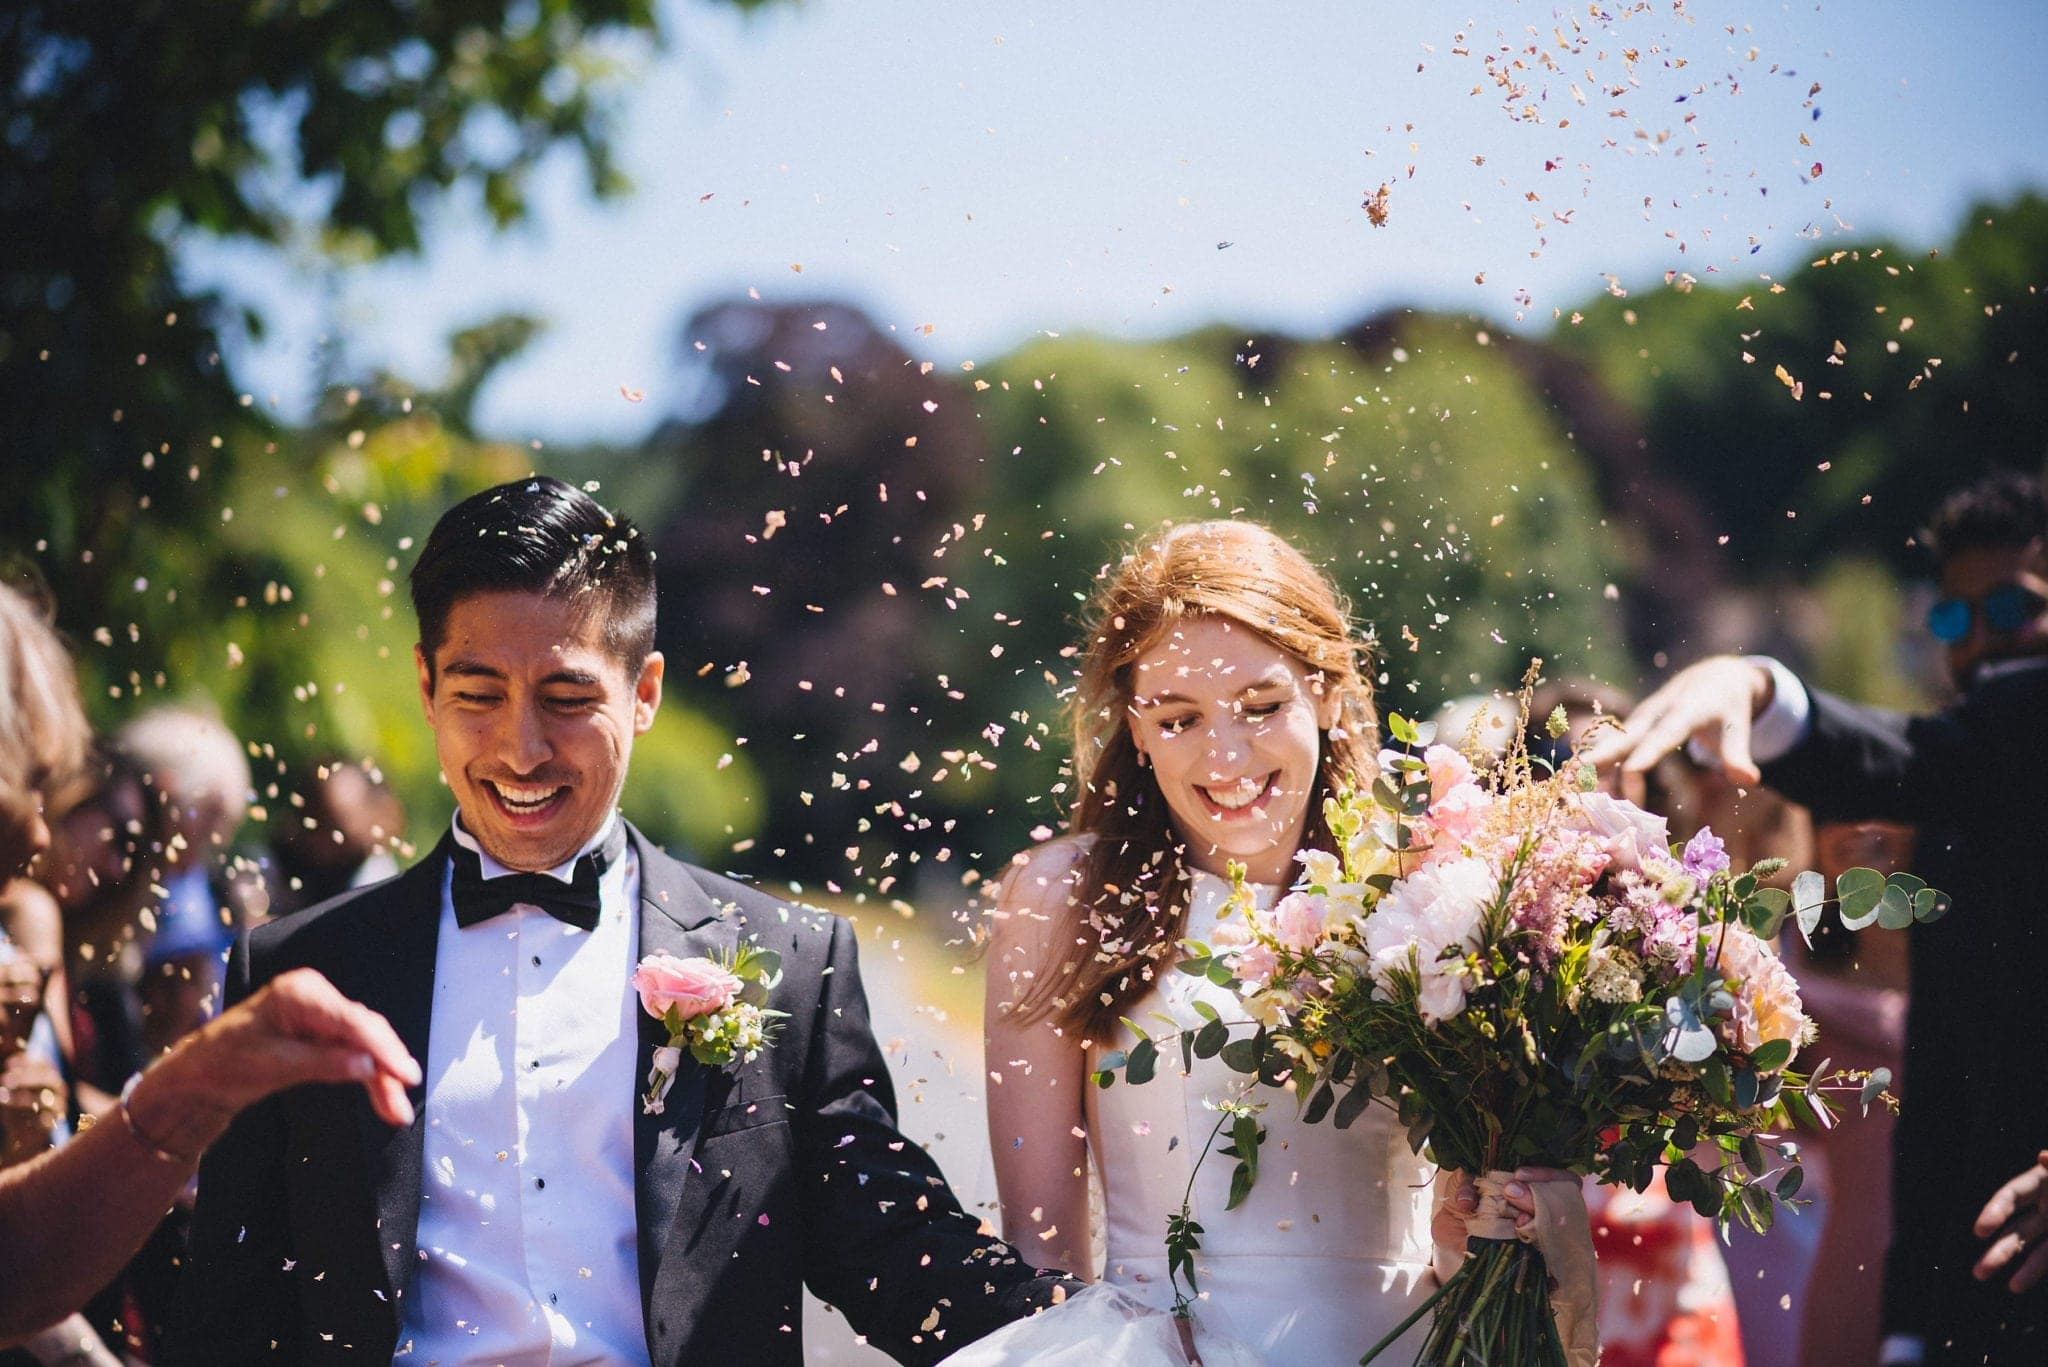 Bride and Groom walking through their confetti shower